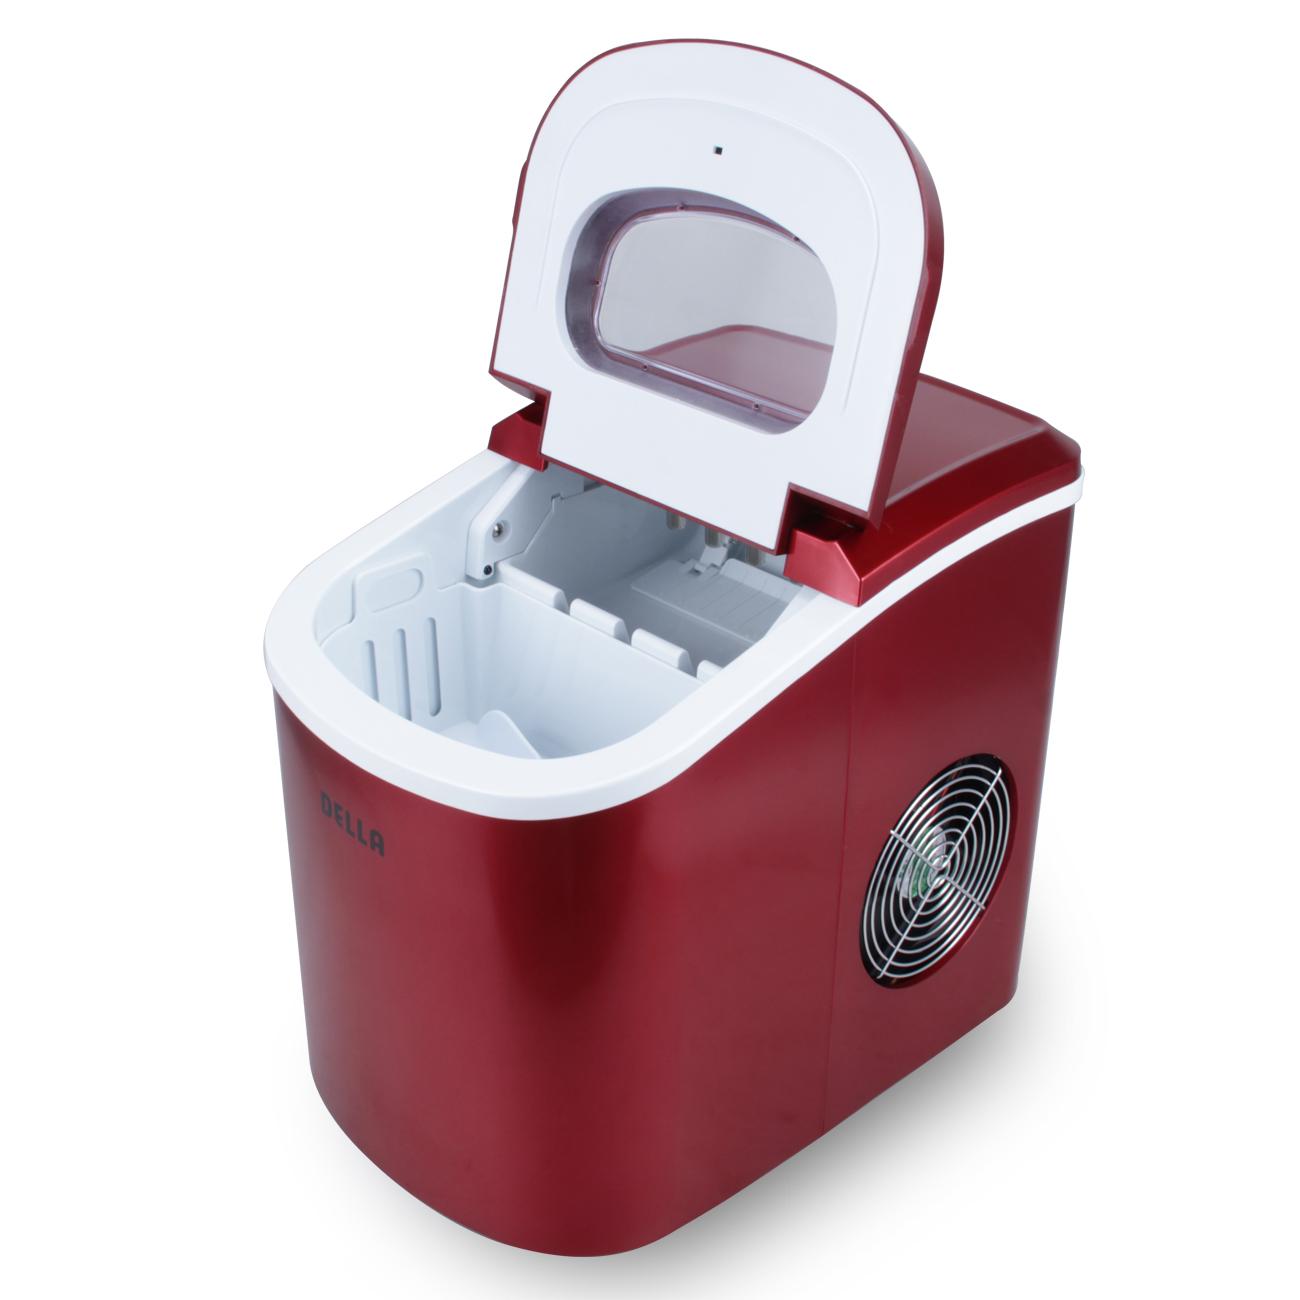 ... Countertop Ice Makers > See more Della? Portable Electric Ice Maker